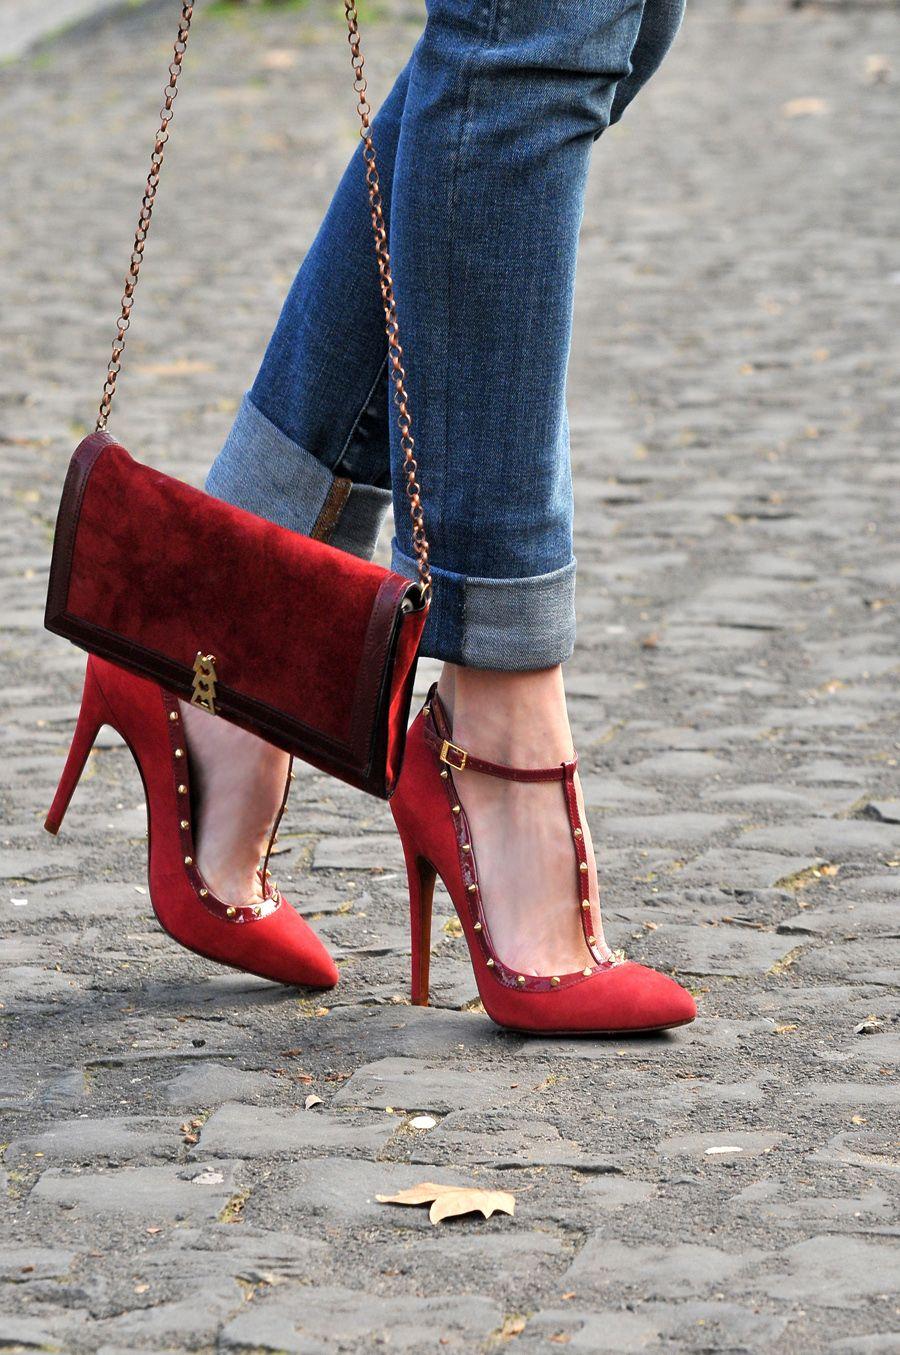 plateau archives bellezza it scarpe rosse scarpe stivaletti borchiati scarpe rosse scarpe stivaletti borchiati